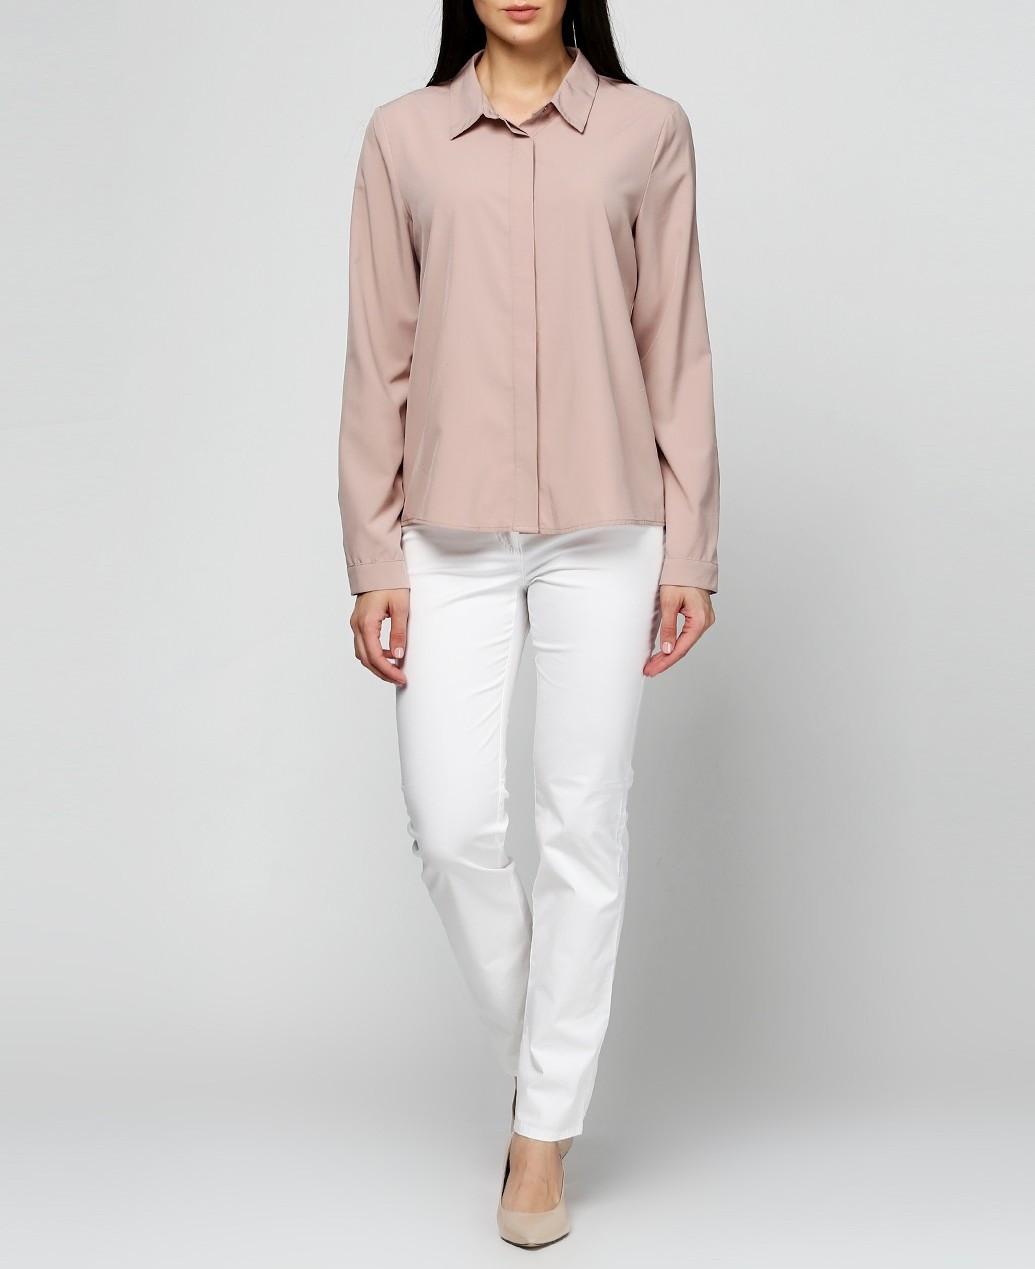 Женские брюки Gerry Weber 40R Белый (2900055521018)